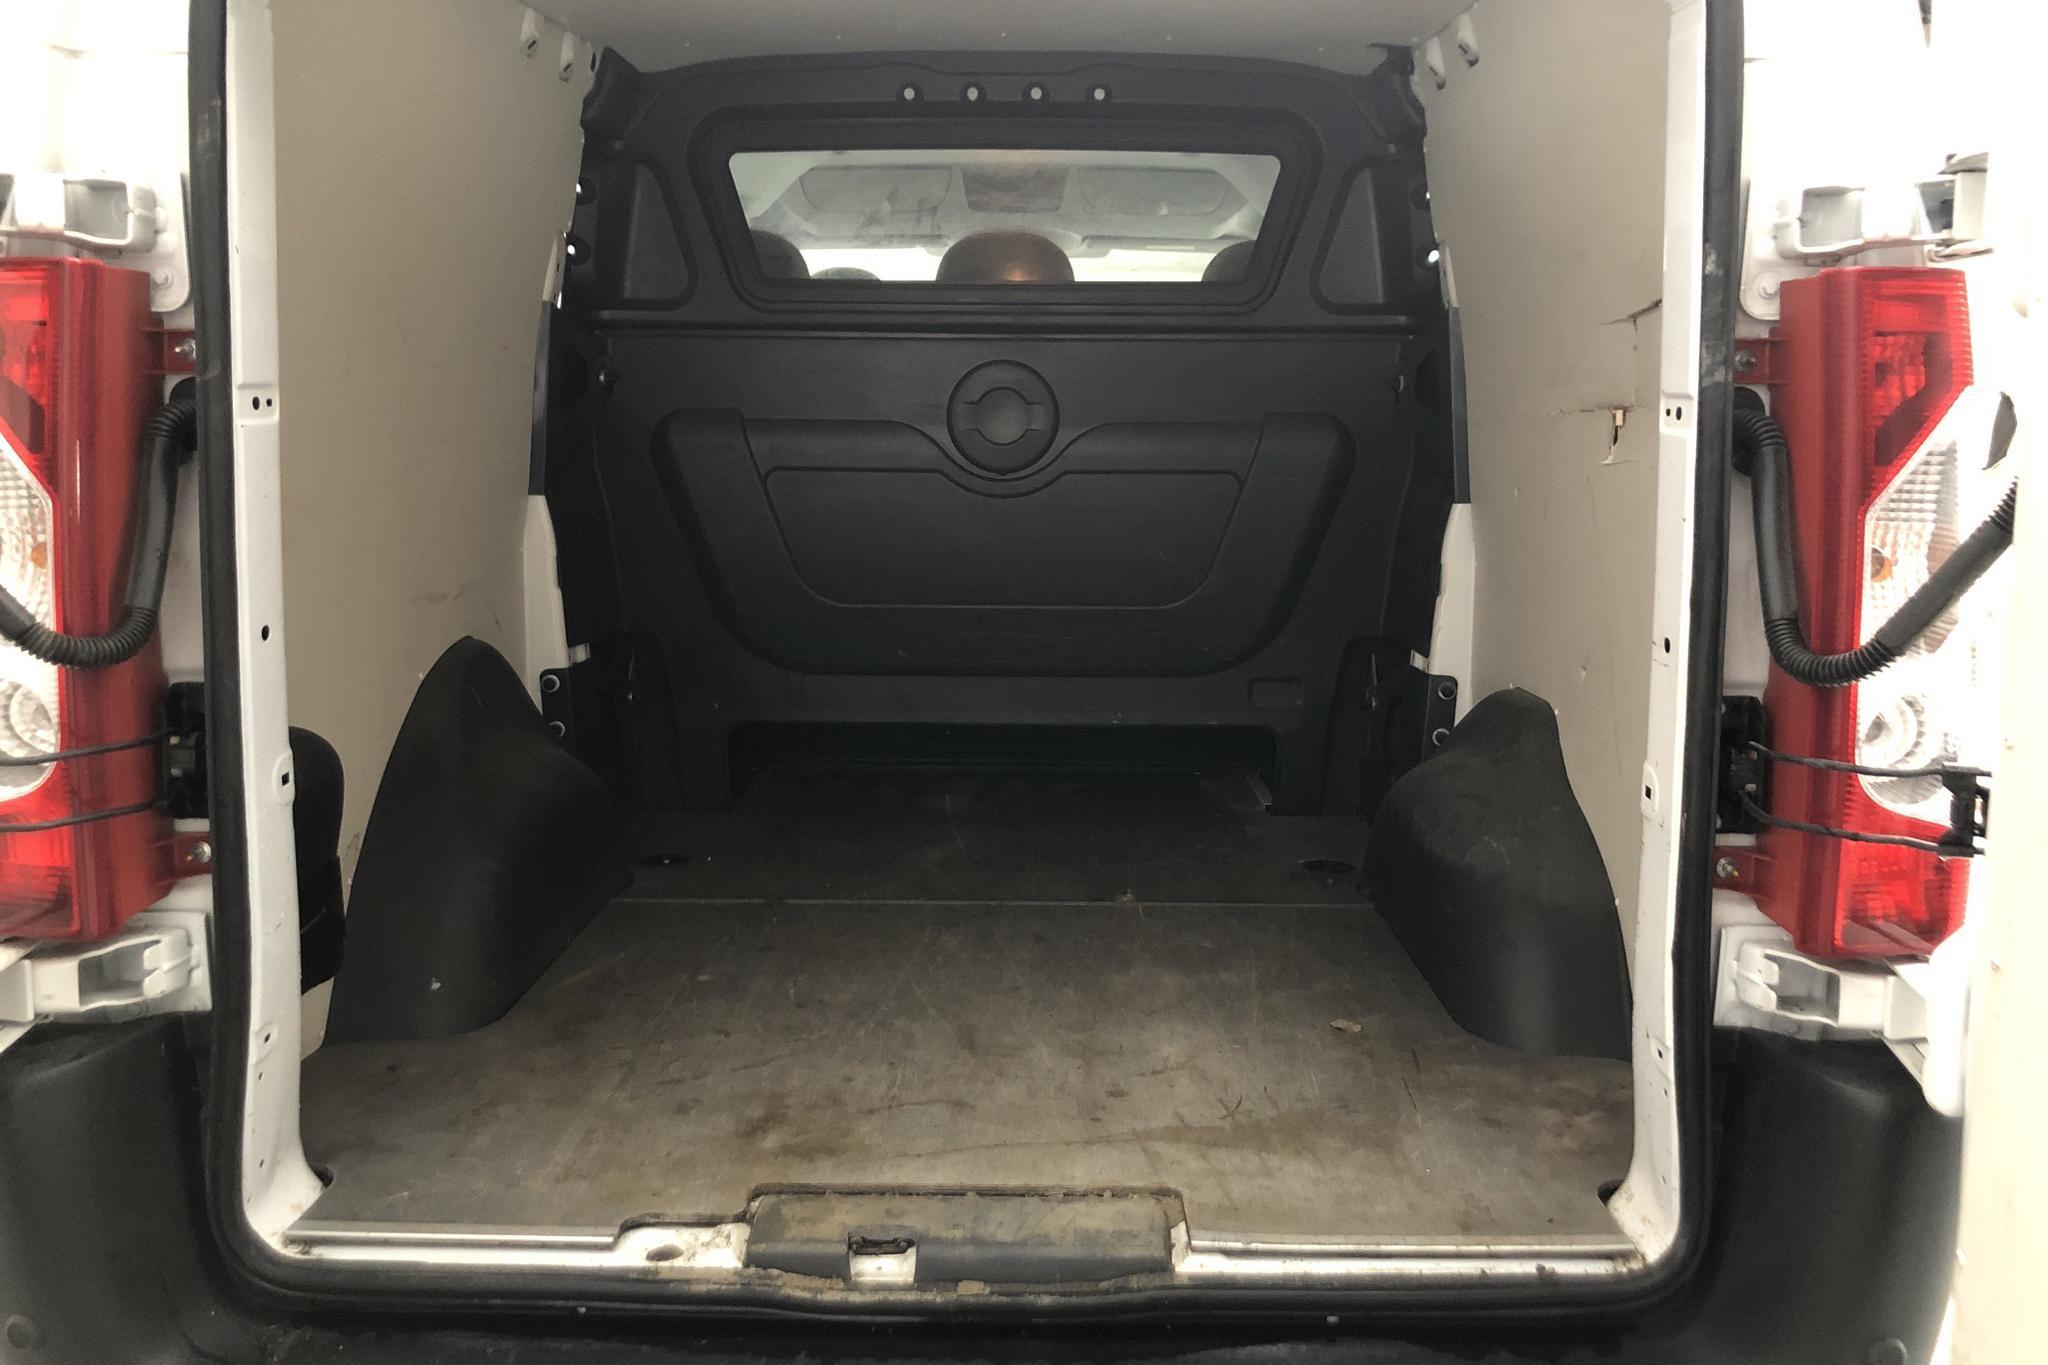 Fiat Scudo 2.0 MJT (130hk) - 10 075 mil - Manuell - vit - 2016